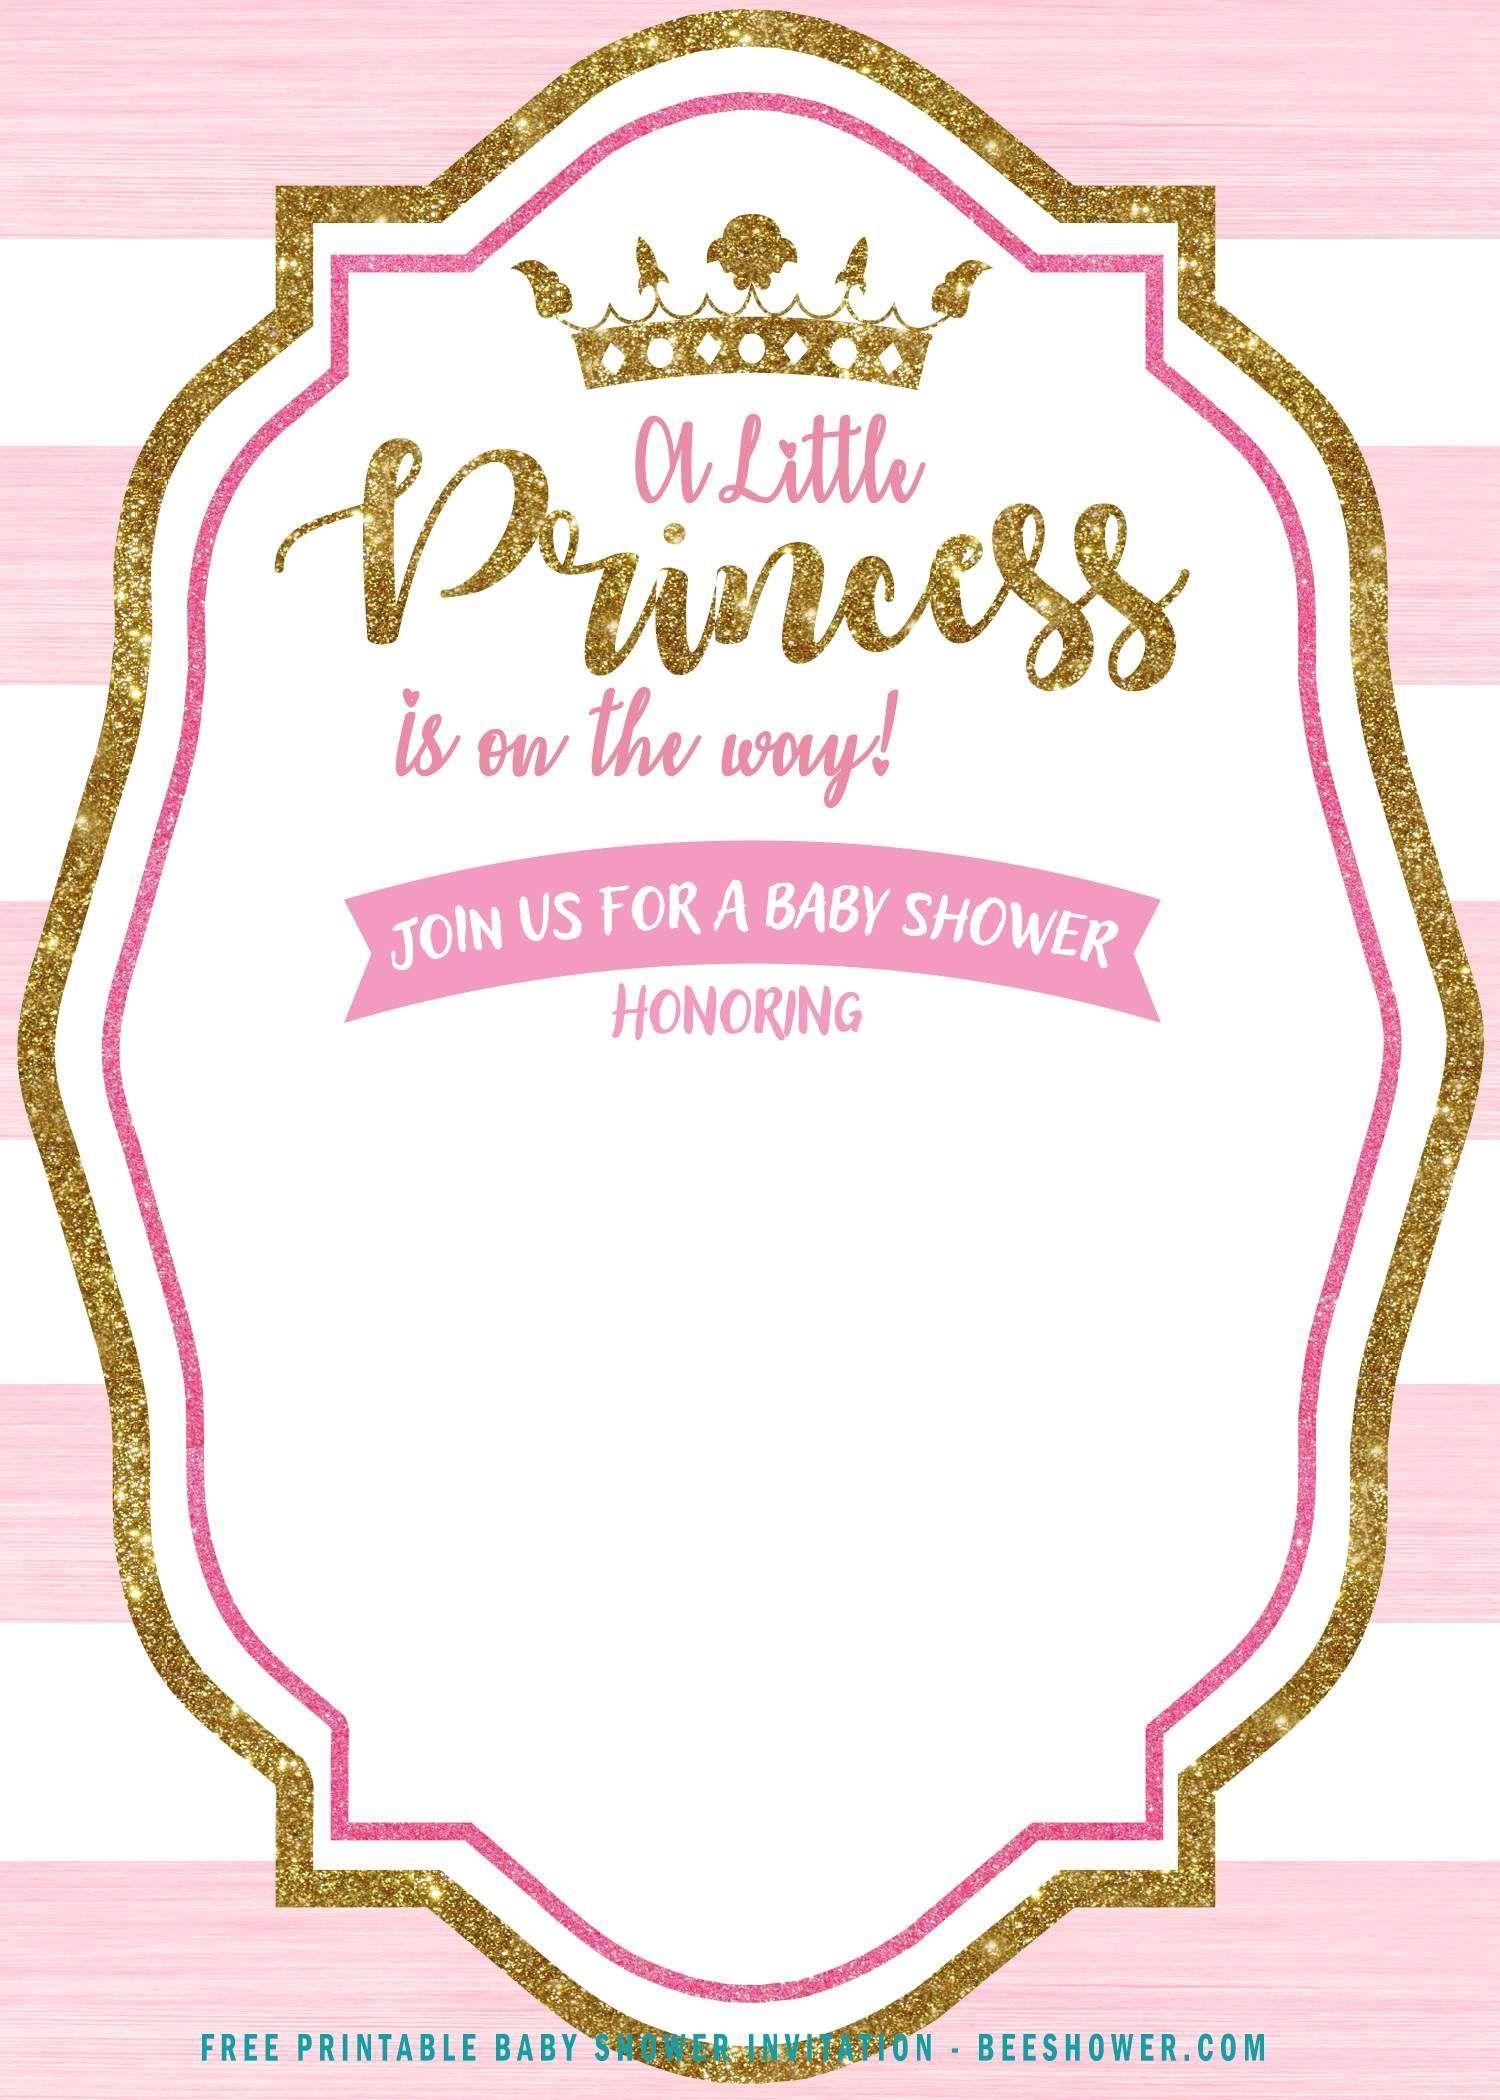 004 Surprising Princes Baby Shower Invitation Template Design  Templates Little Royal Red DisneyFull